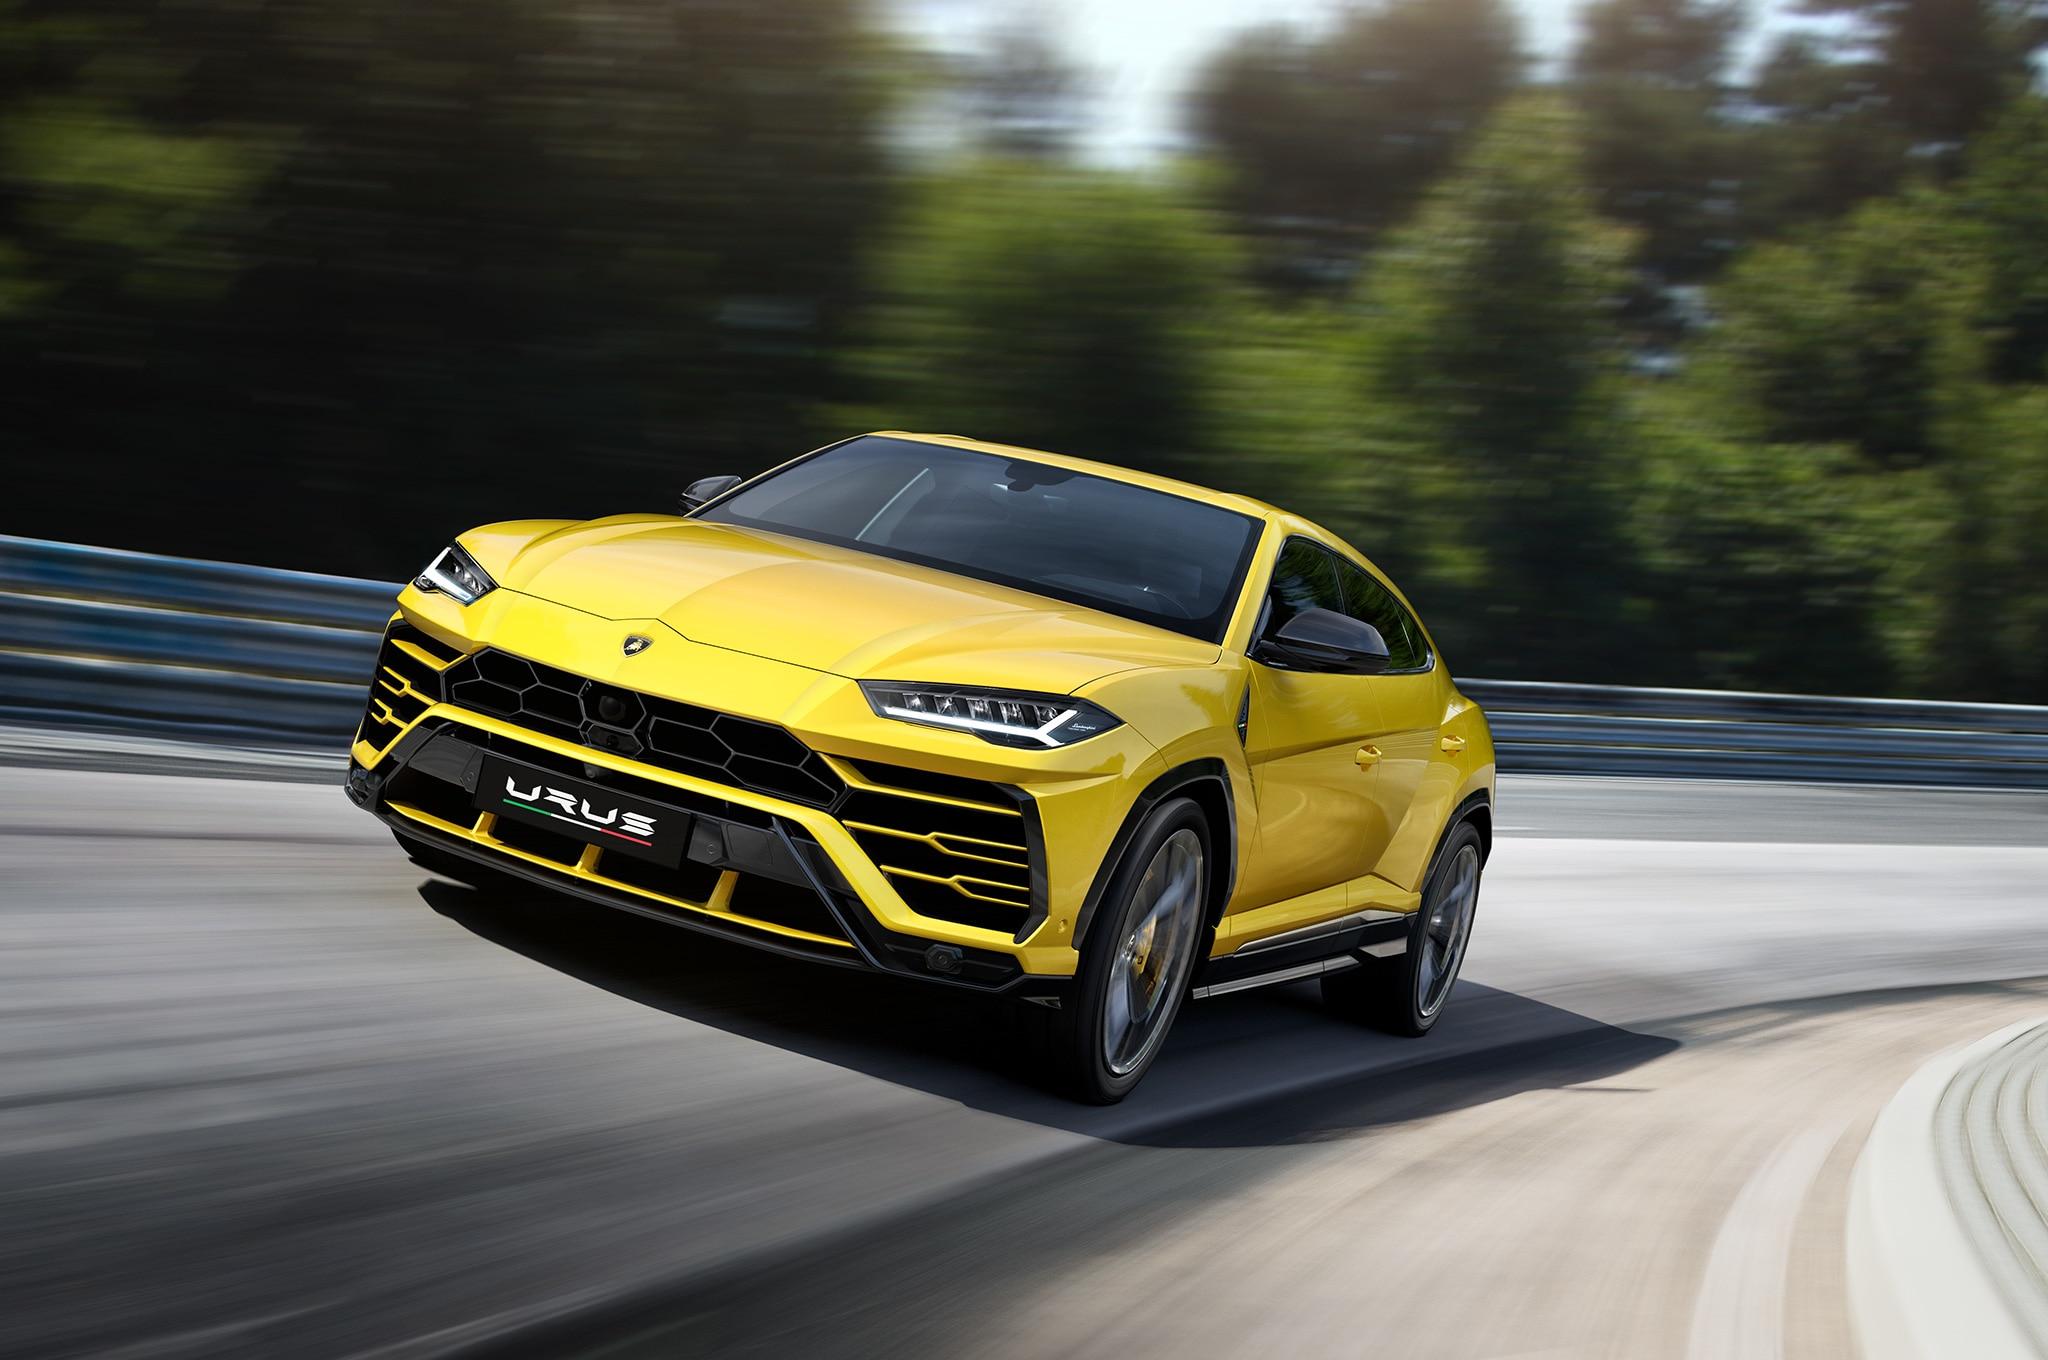 2019-Lamborghini-Urus-front-motion-view.jpg